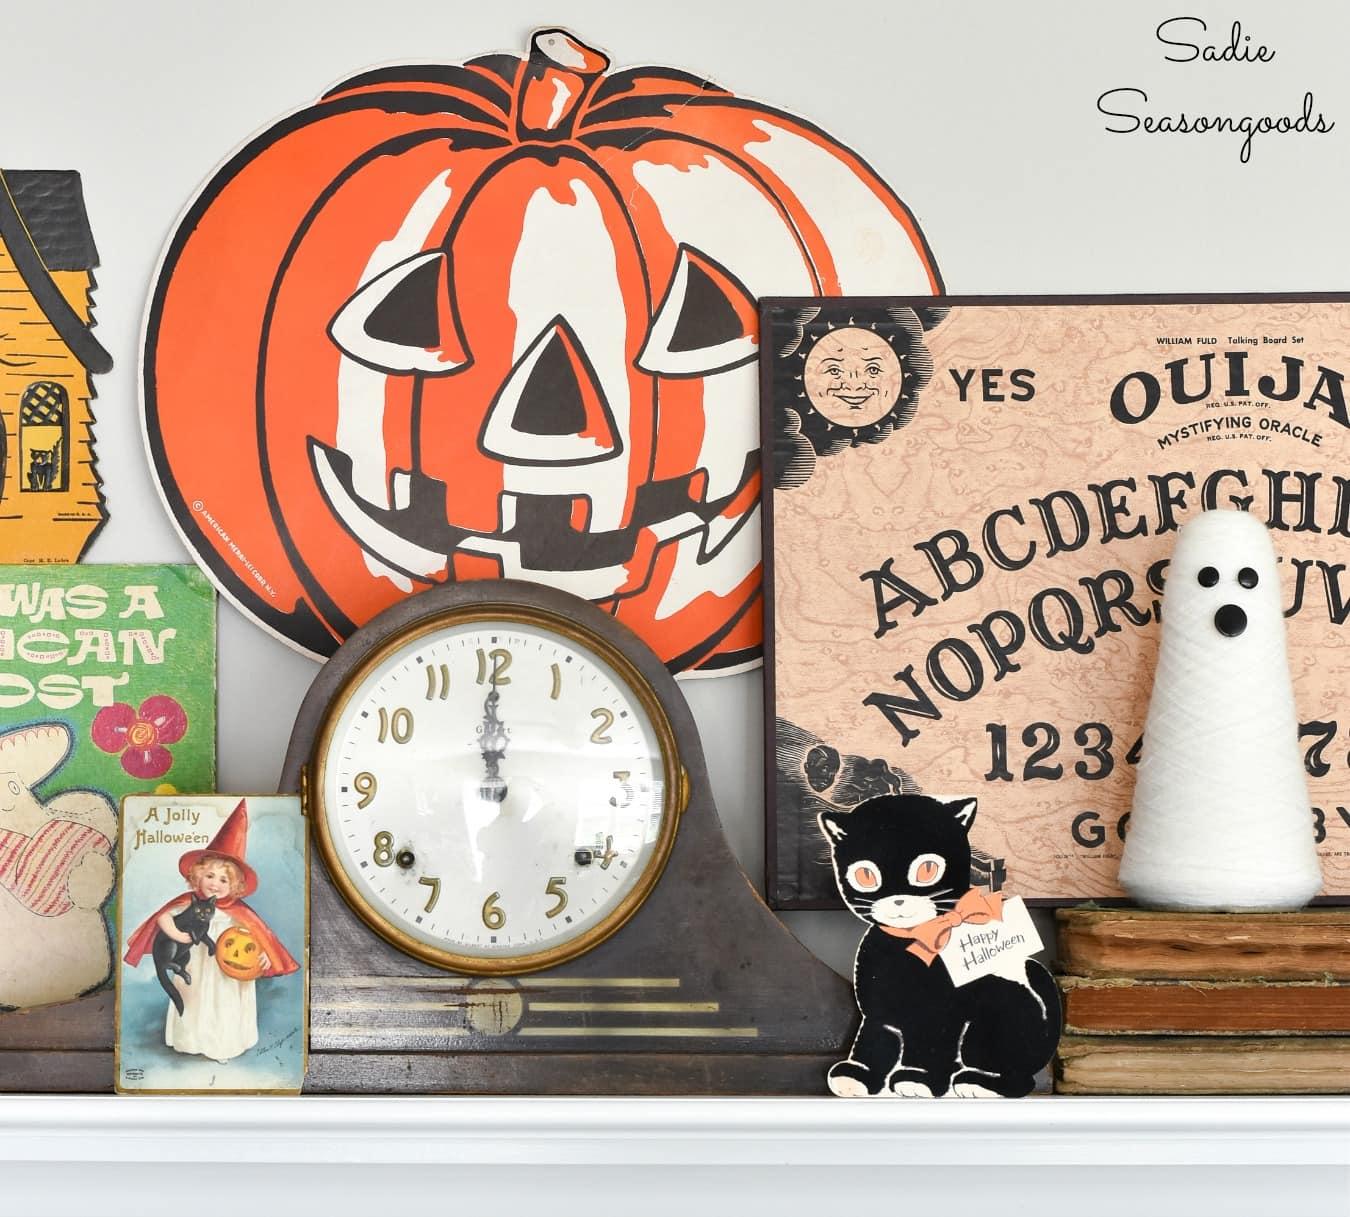 Vintage Ouija board as Halloween mantel decor